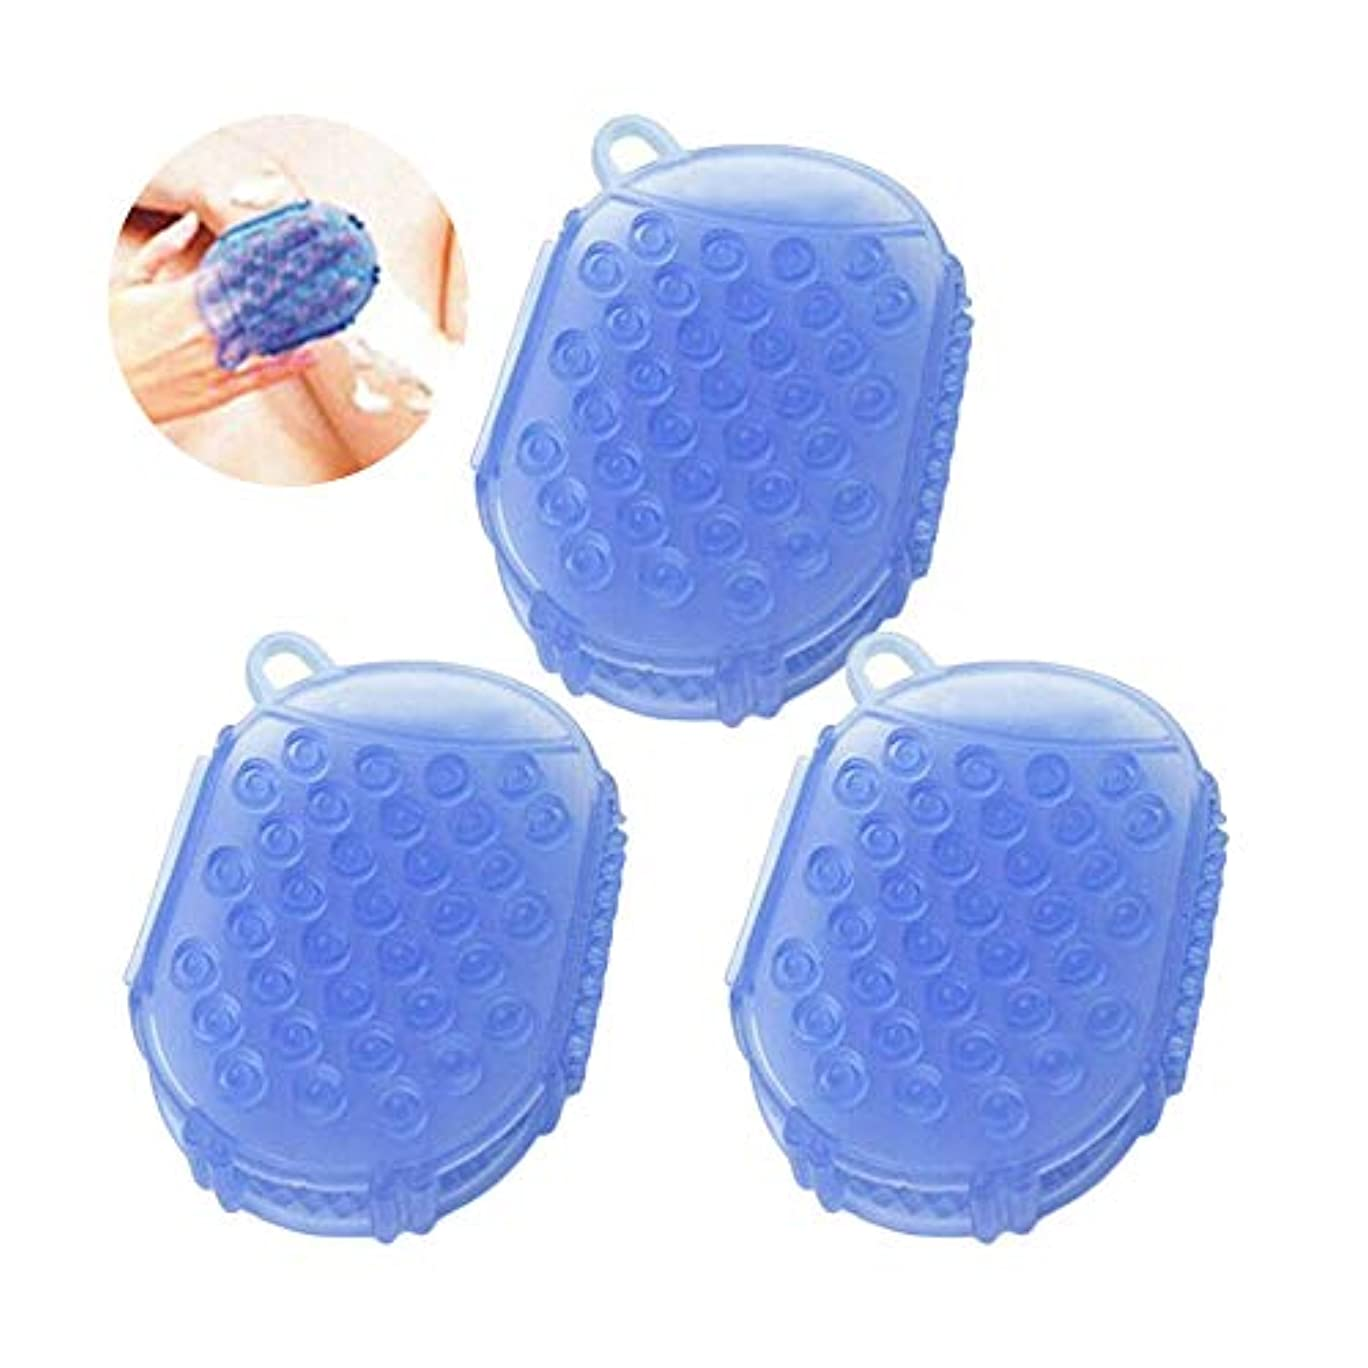 RAYNAG 3個 ボディブラシ マッサージブラシ お風呂ブラシ 体洗い 角質除去 血行促進 新陳代謝を促進 美肌効果 毛穴 汚れ 除去 マッサージ ブラシ シャワー お風呂 両面用 10.5x7.5x2cm ランダムカラー